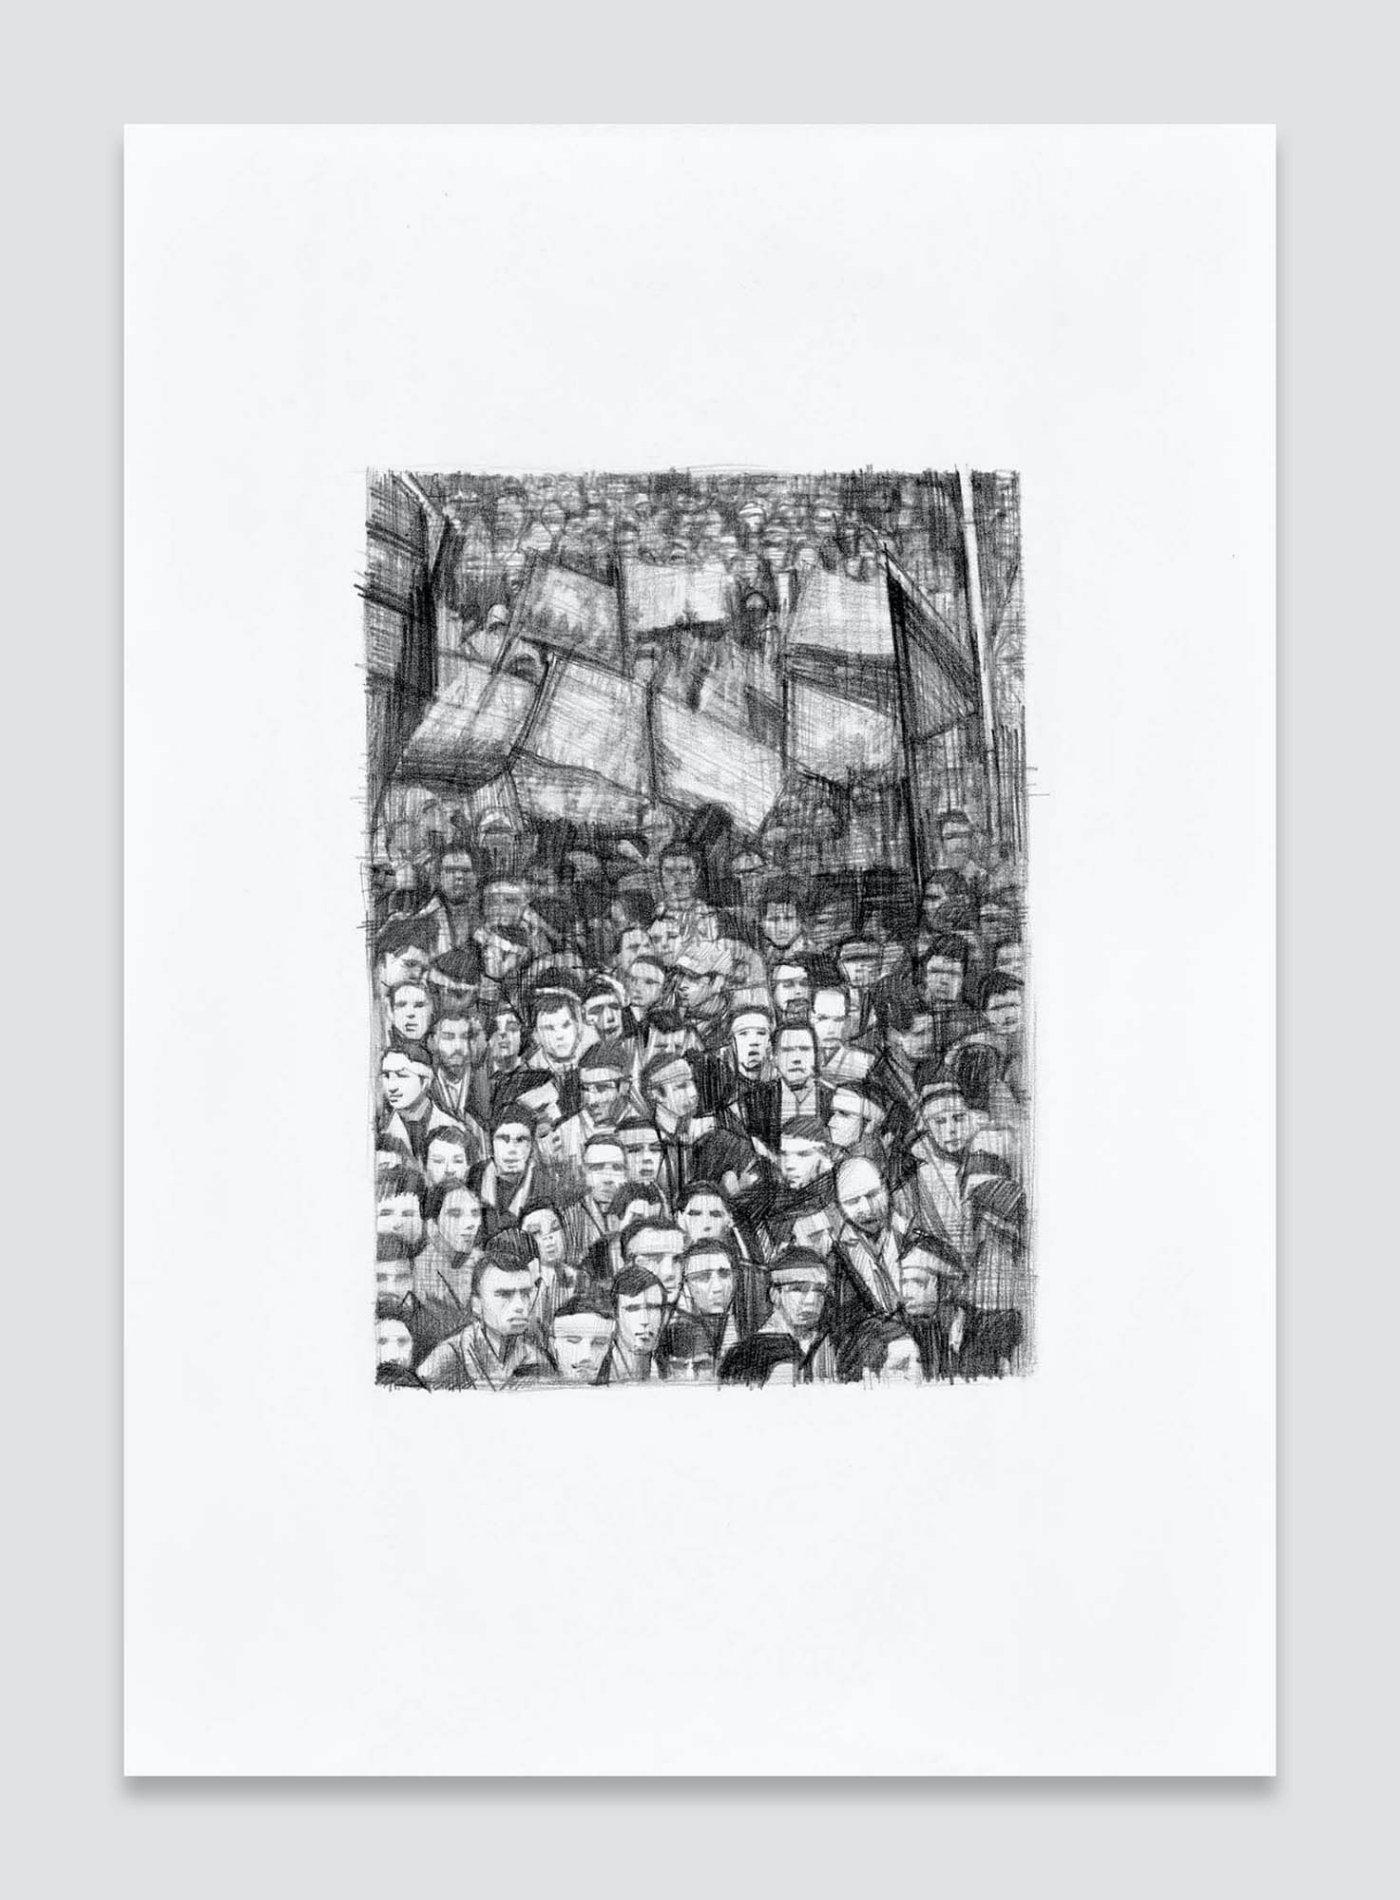 Untitled (Demonstration No. 193)